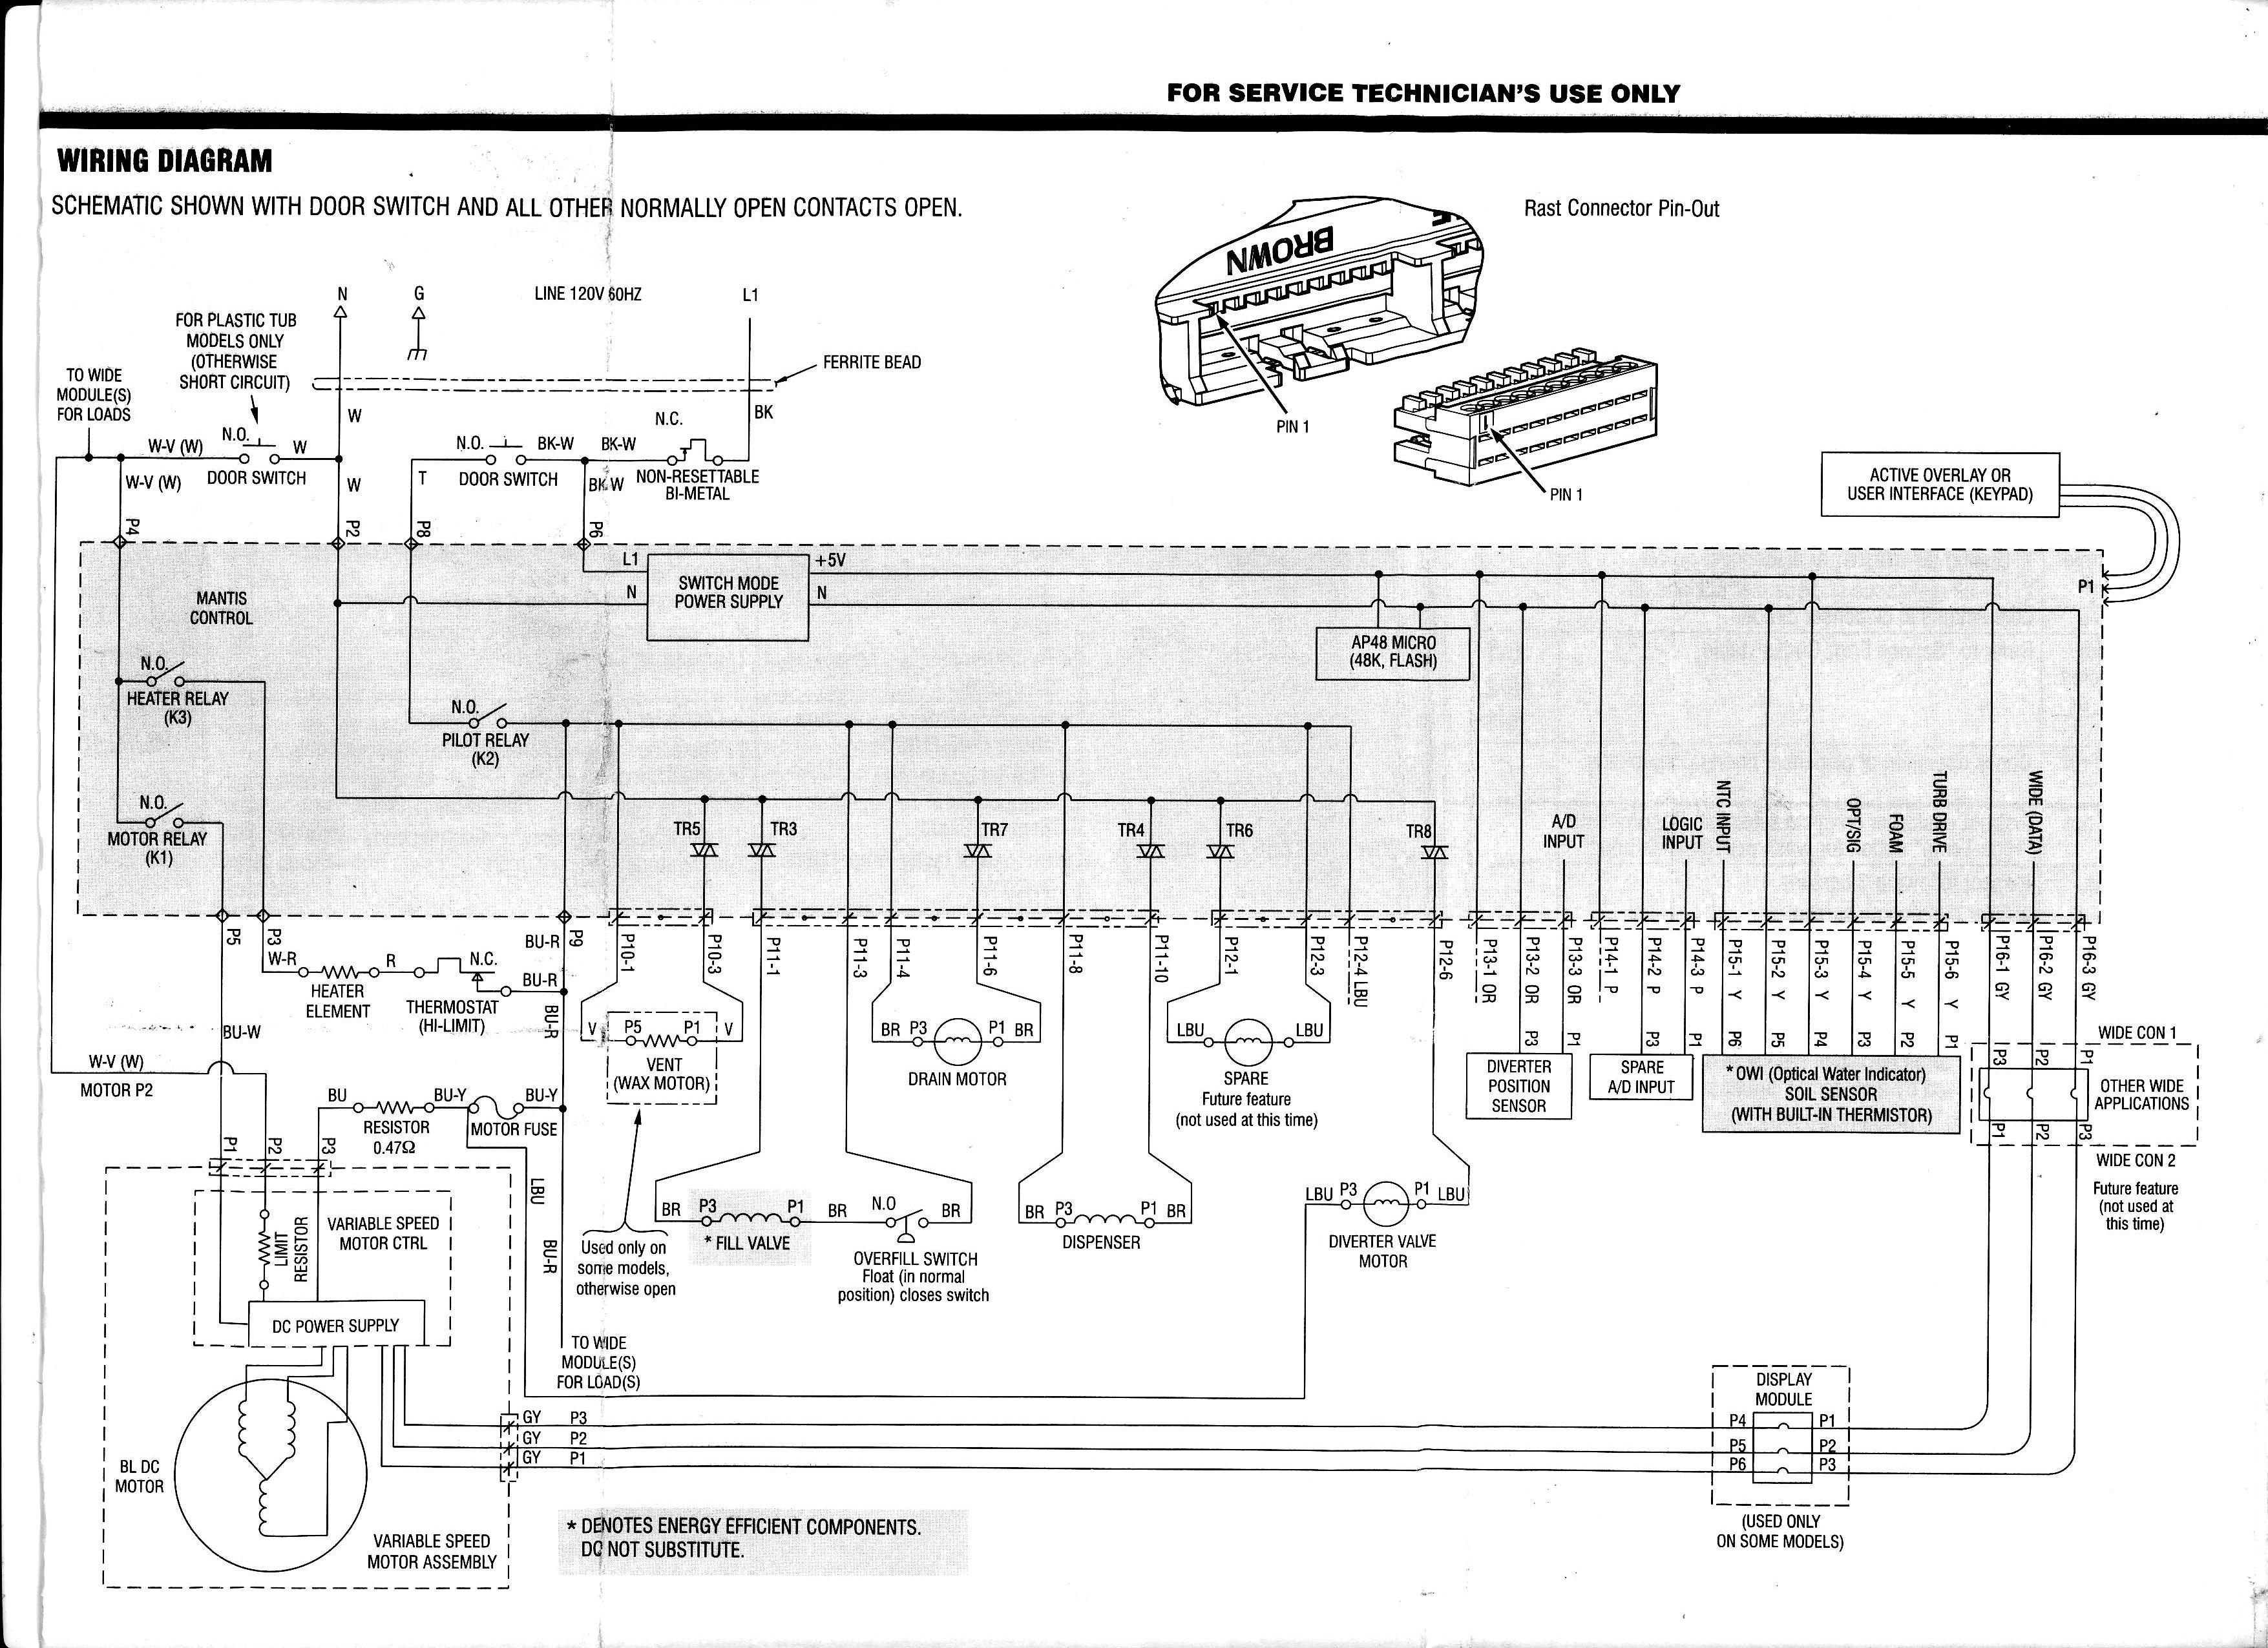 Kenmore Dishwasher Wiring Diagram Unique International 4700 Wiring Diagram Pdf Diagram Of Kenmore Dishwasher Wiring Diagram